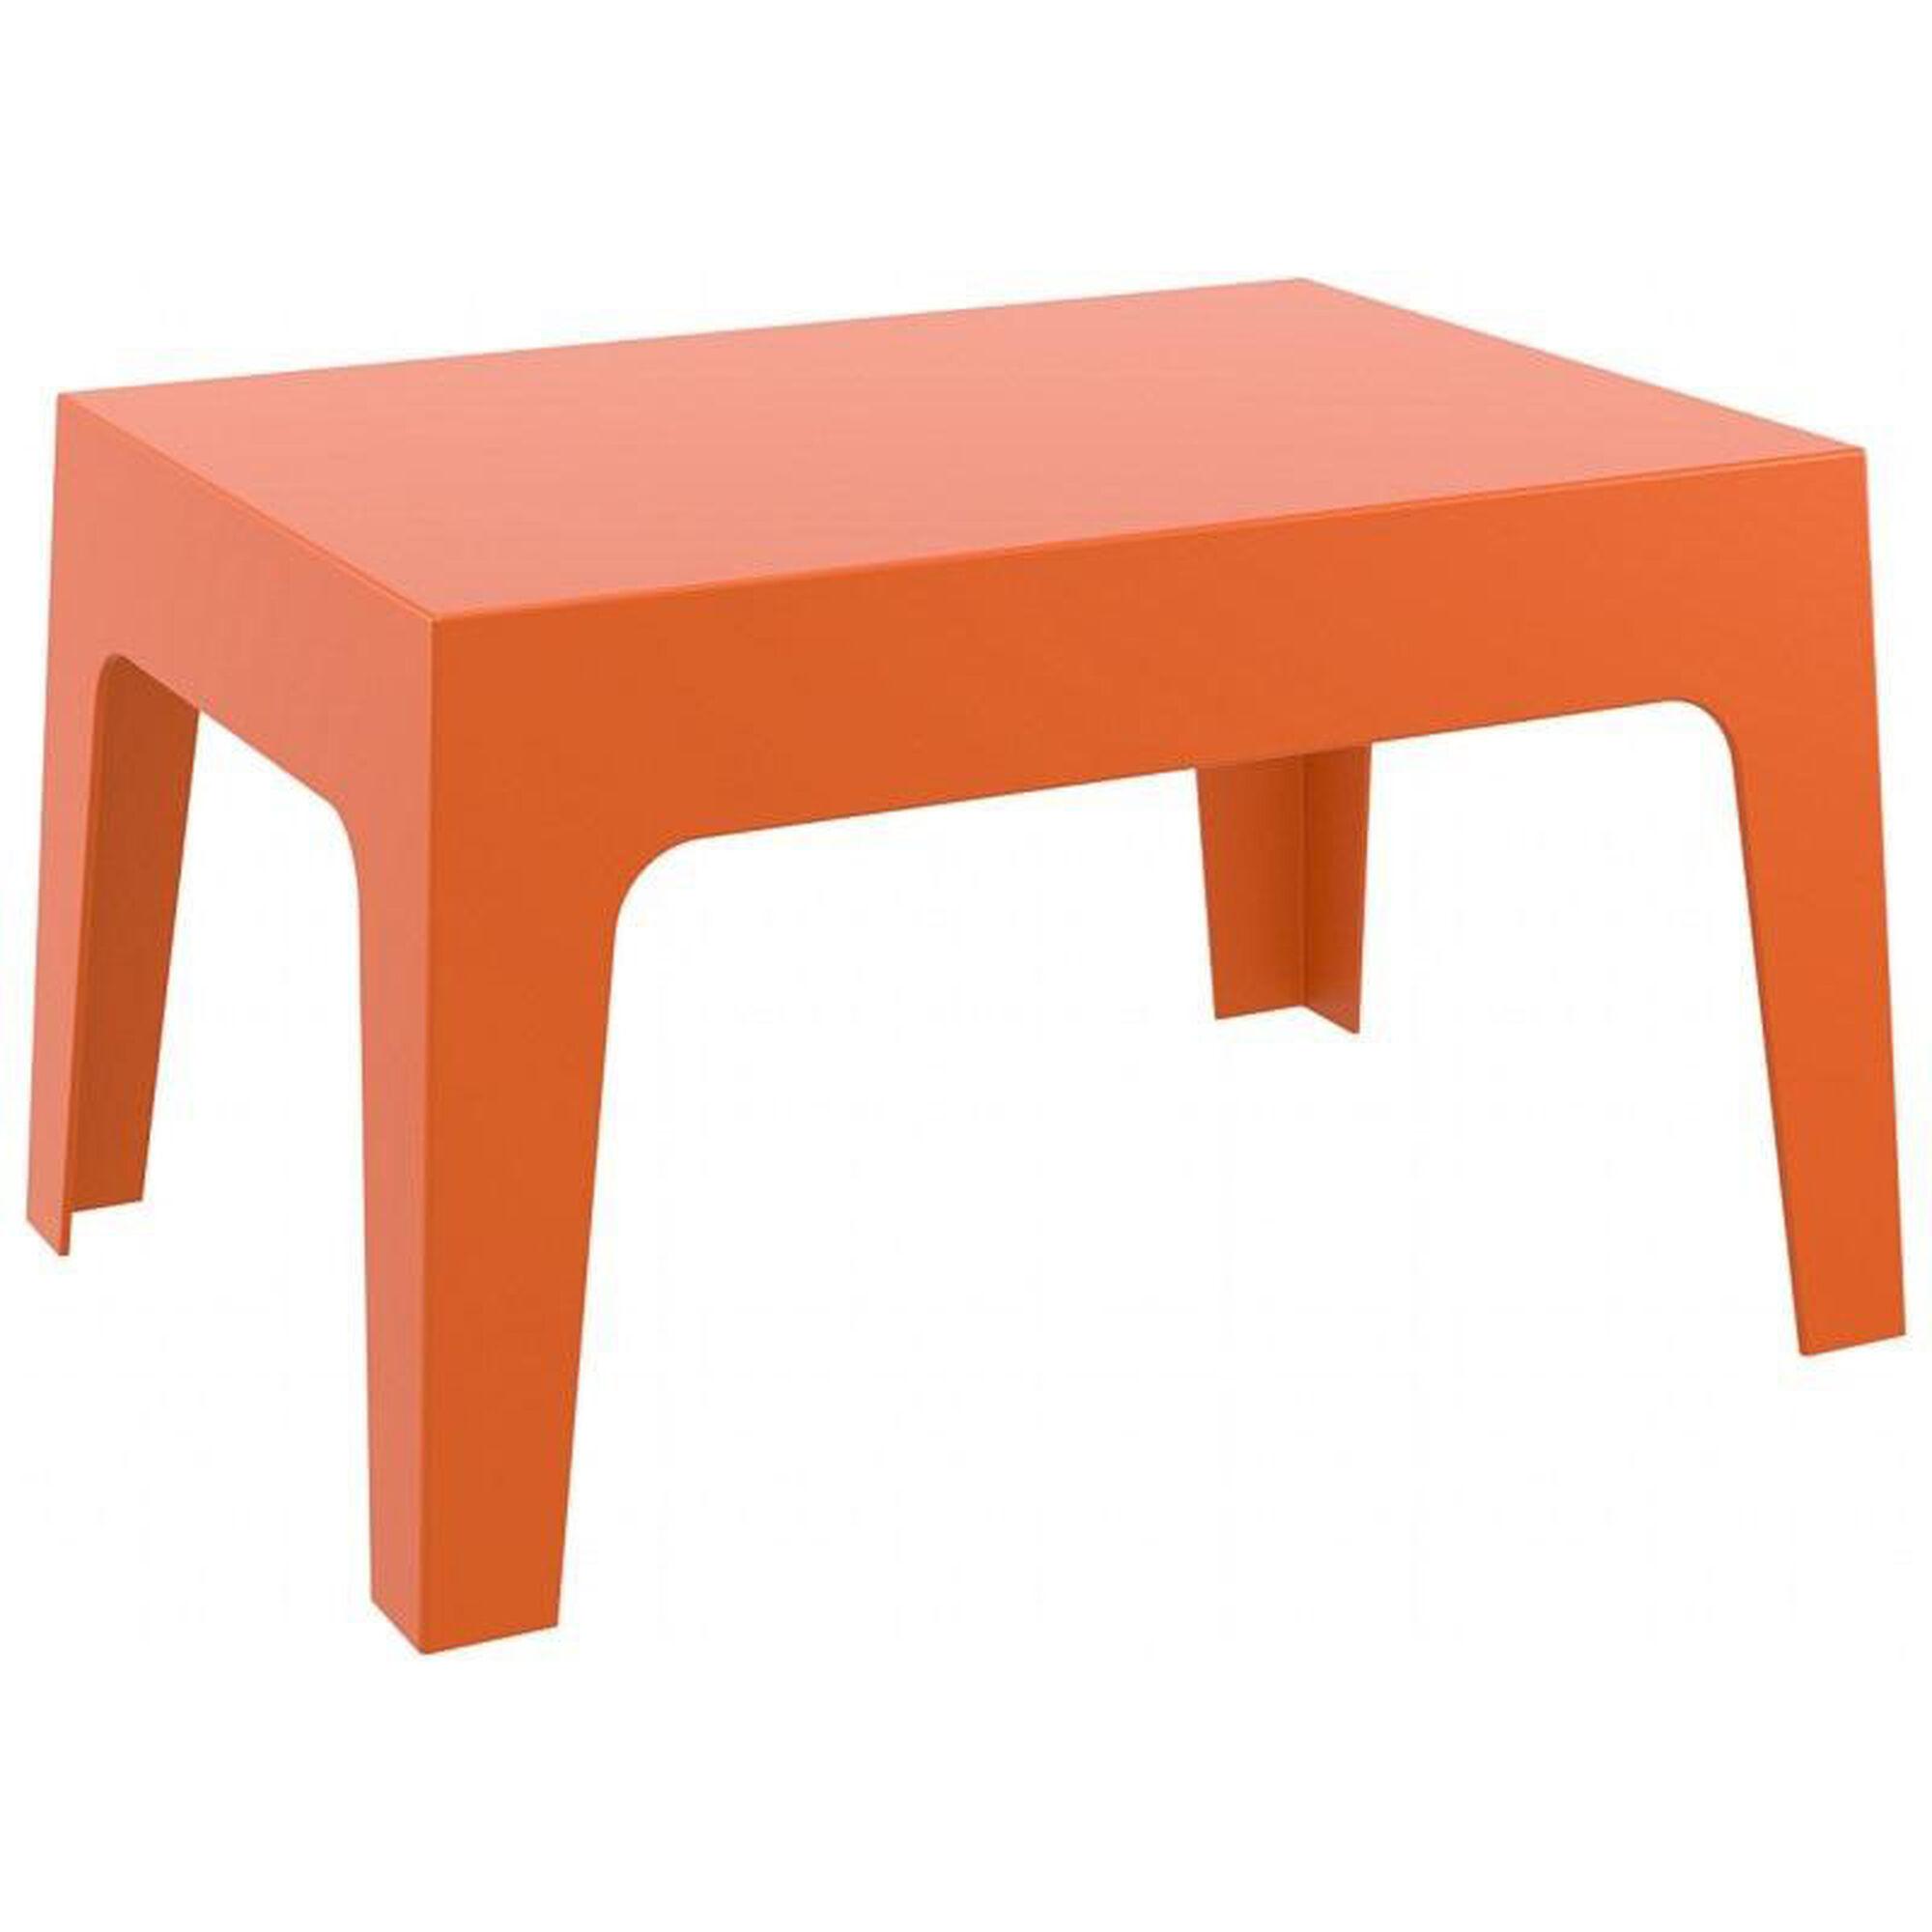 compamia isp064 ora cmp. Black Bedroom Furniture Sets. Home Design Ideas